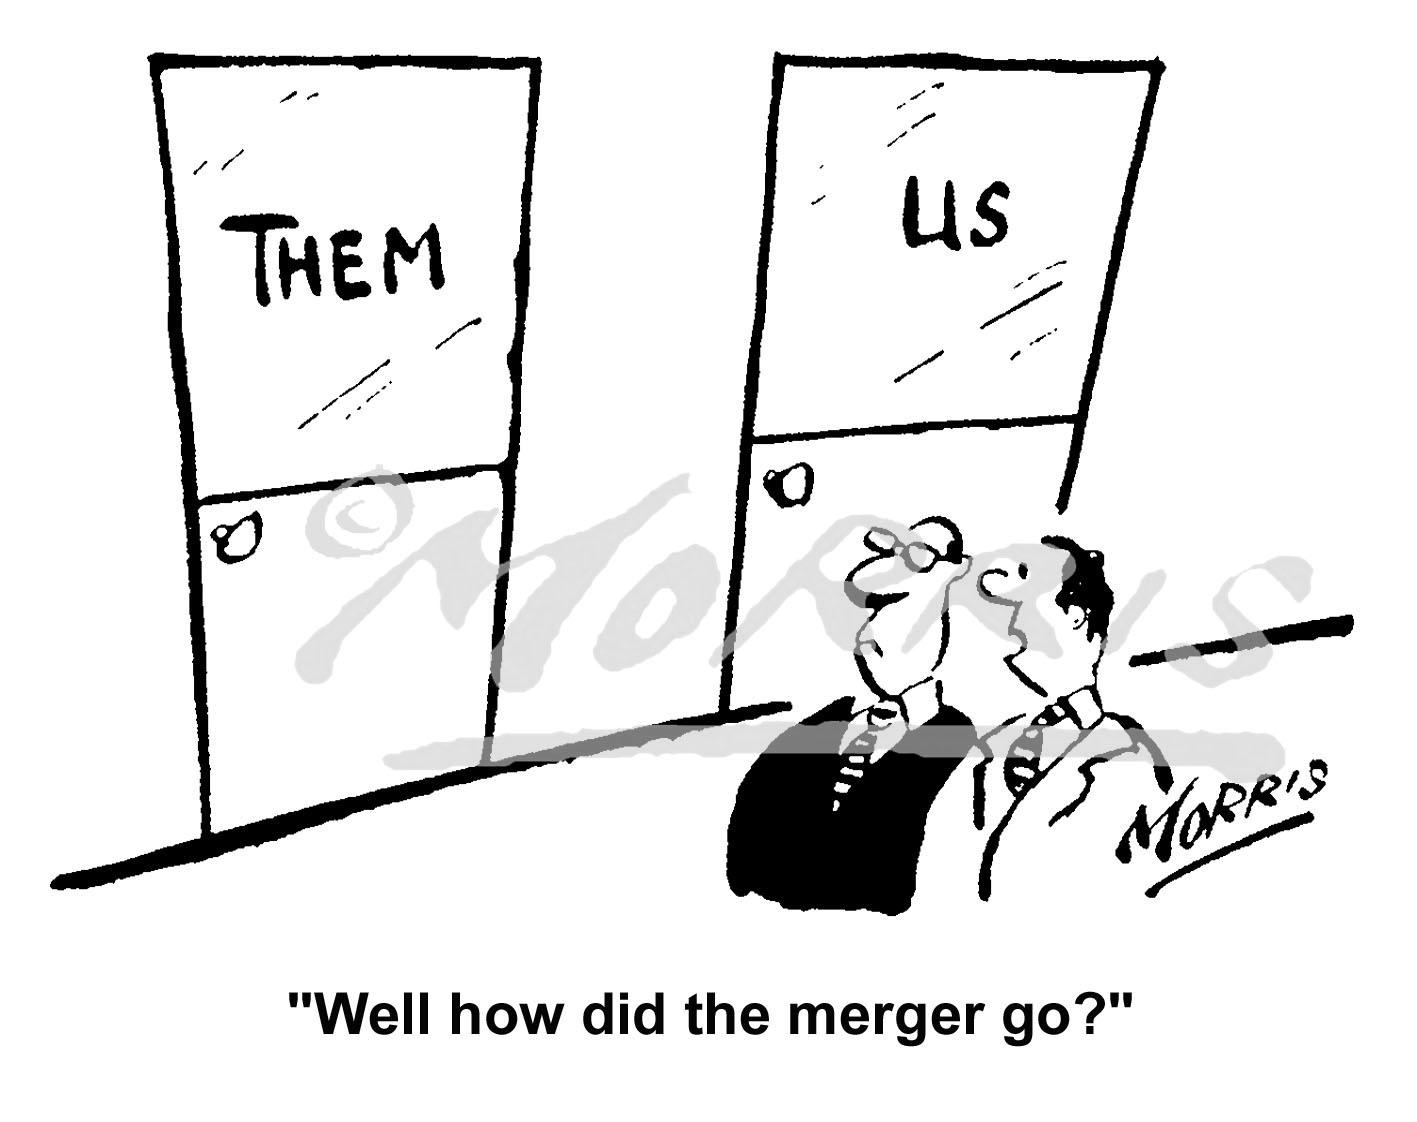 Company merger cartoon – Ref: 5126bw